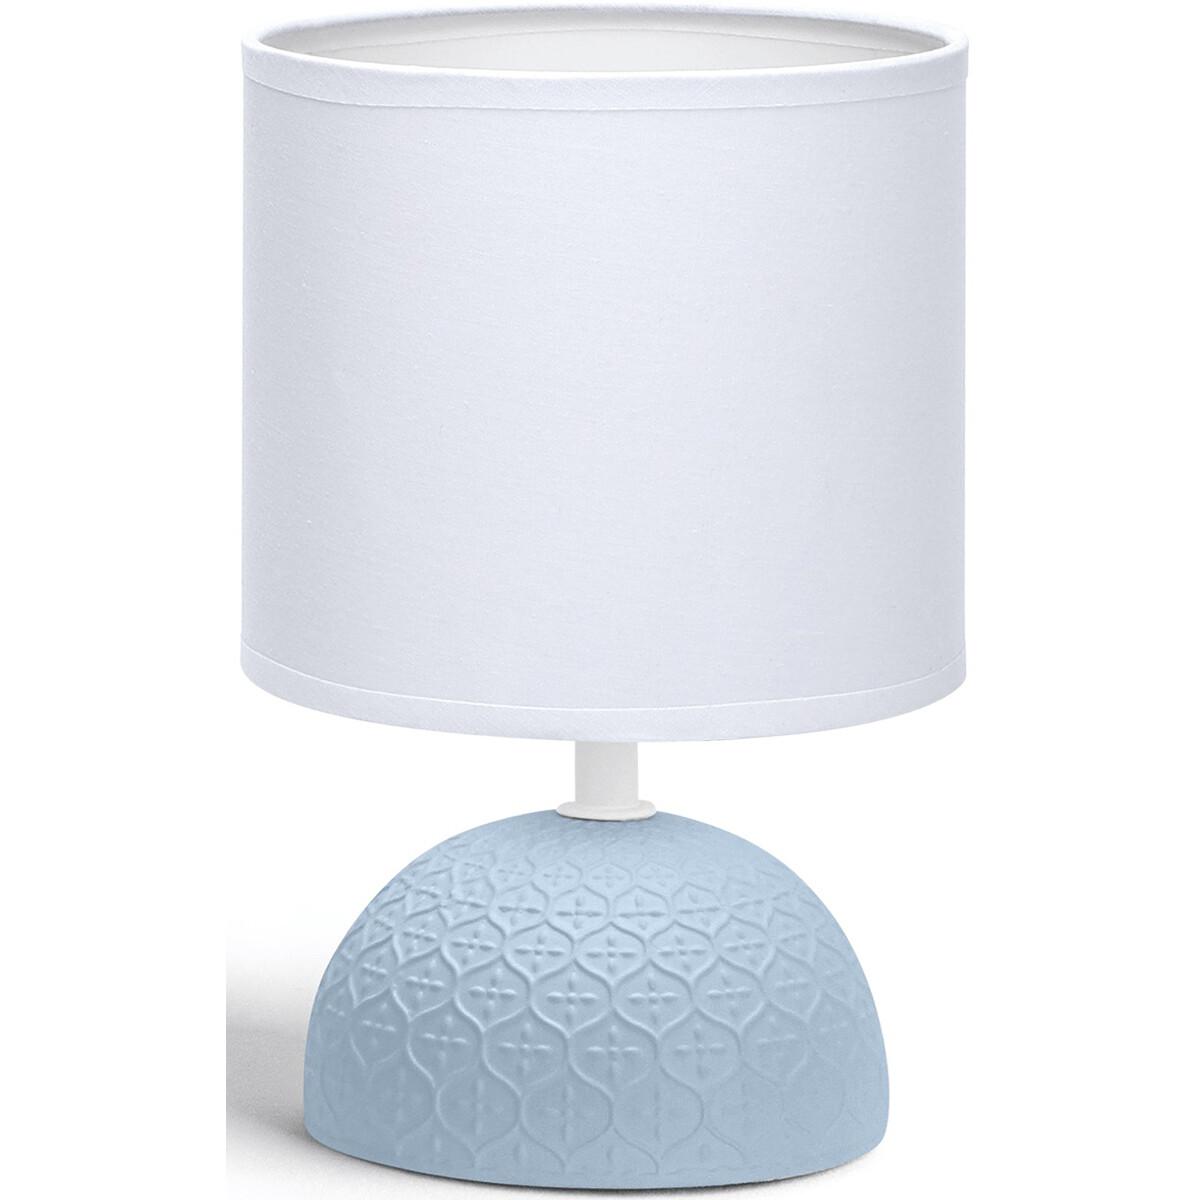 LED Tafellamp - Tafelverlichting - Aigi Conton 1 - E14 Fitting - Rond - Mat Blauw - Keramiek